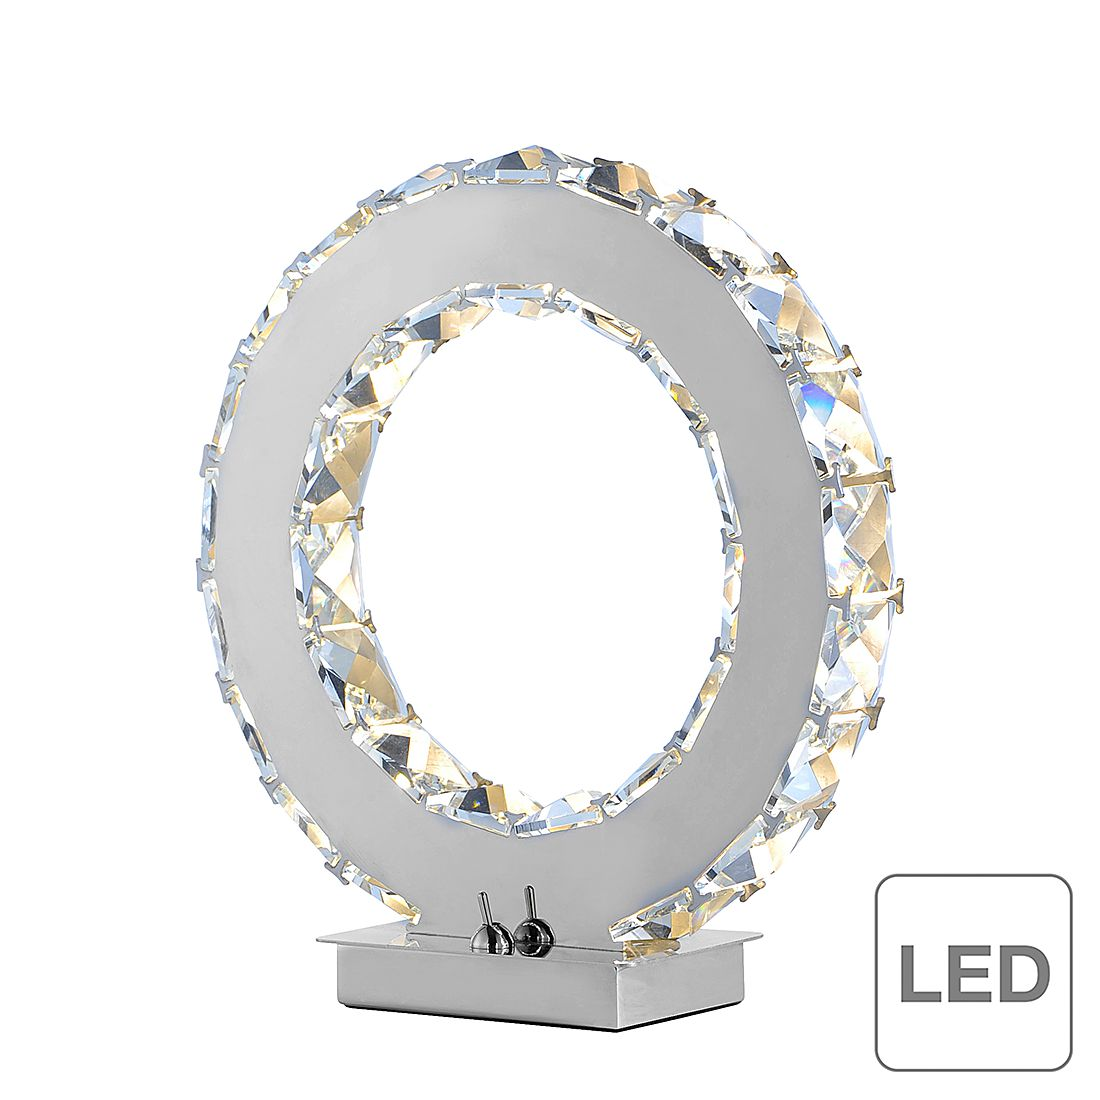 LED-Tischleuchte Jola ● Chrom/ Kristall ● Silber- Paul Neuhaus A+